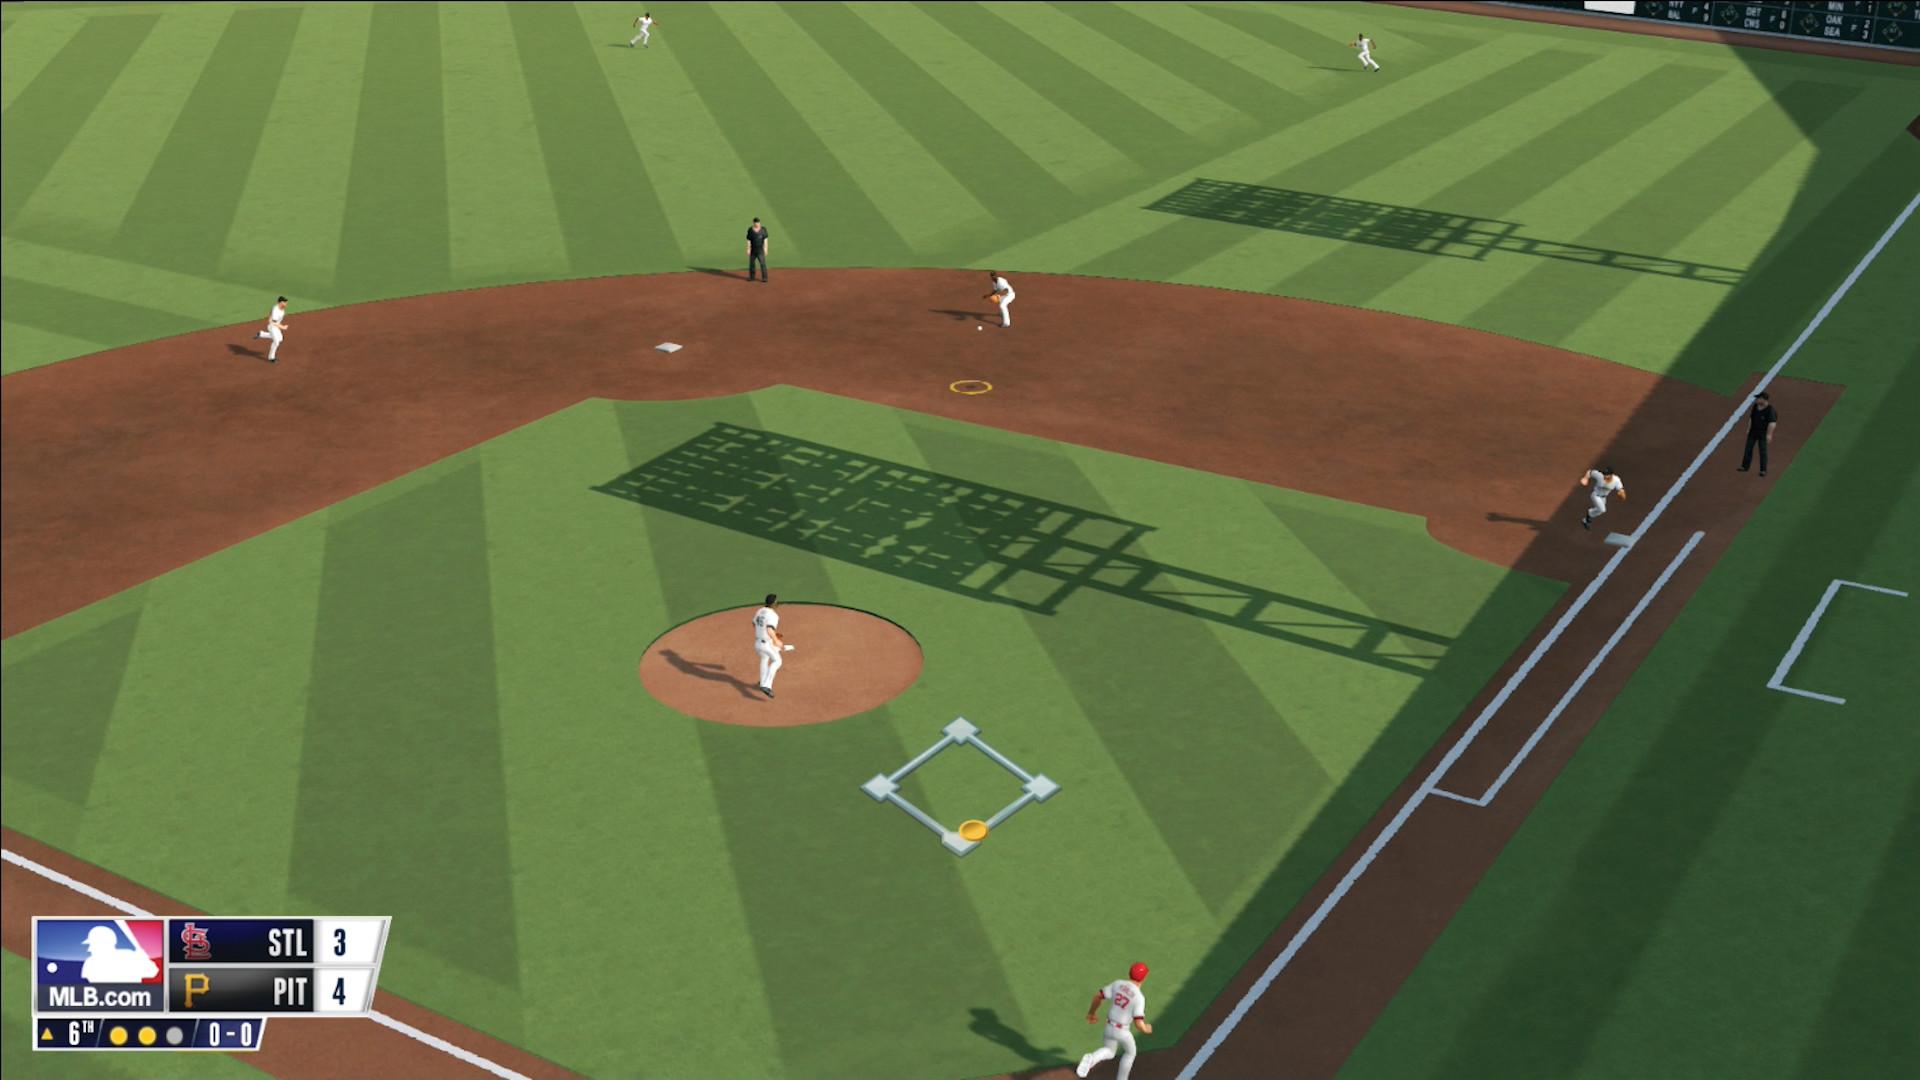 R.B.I. Baseball 16 image 3